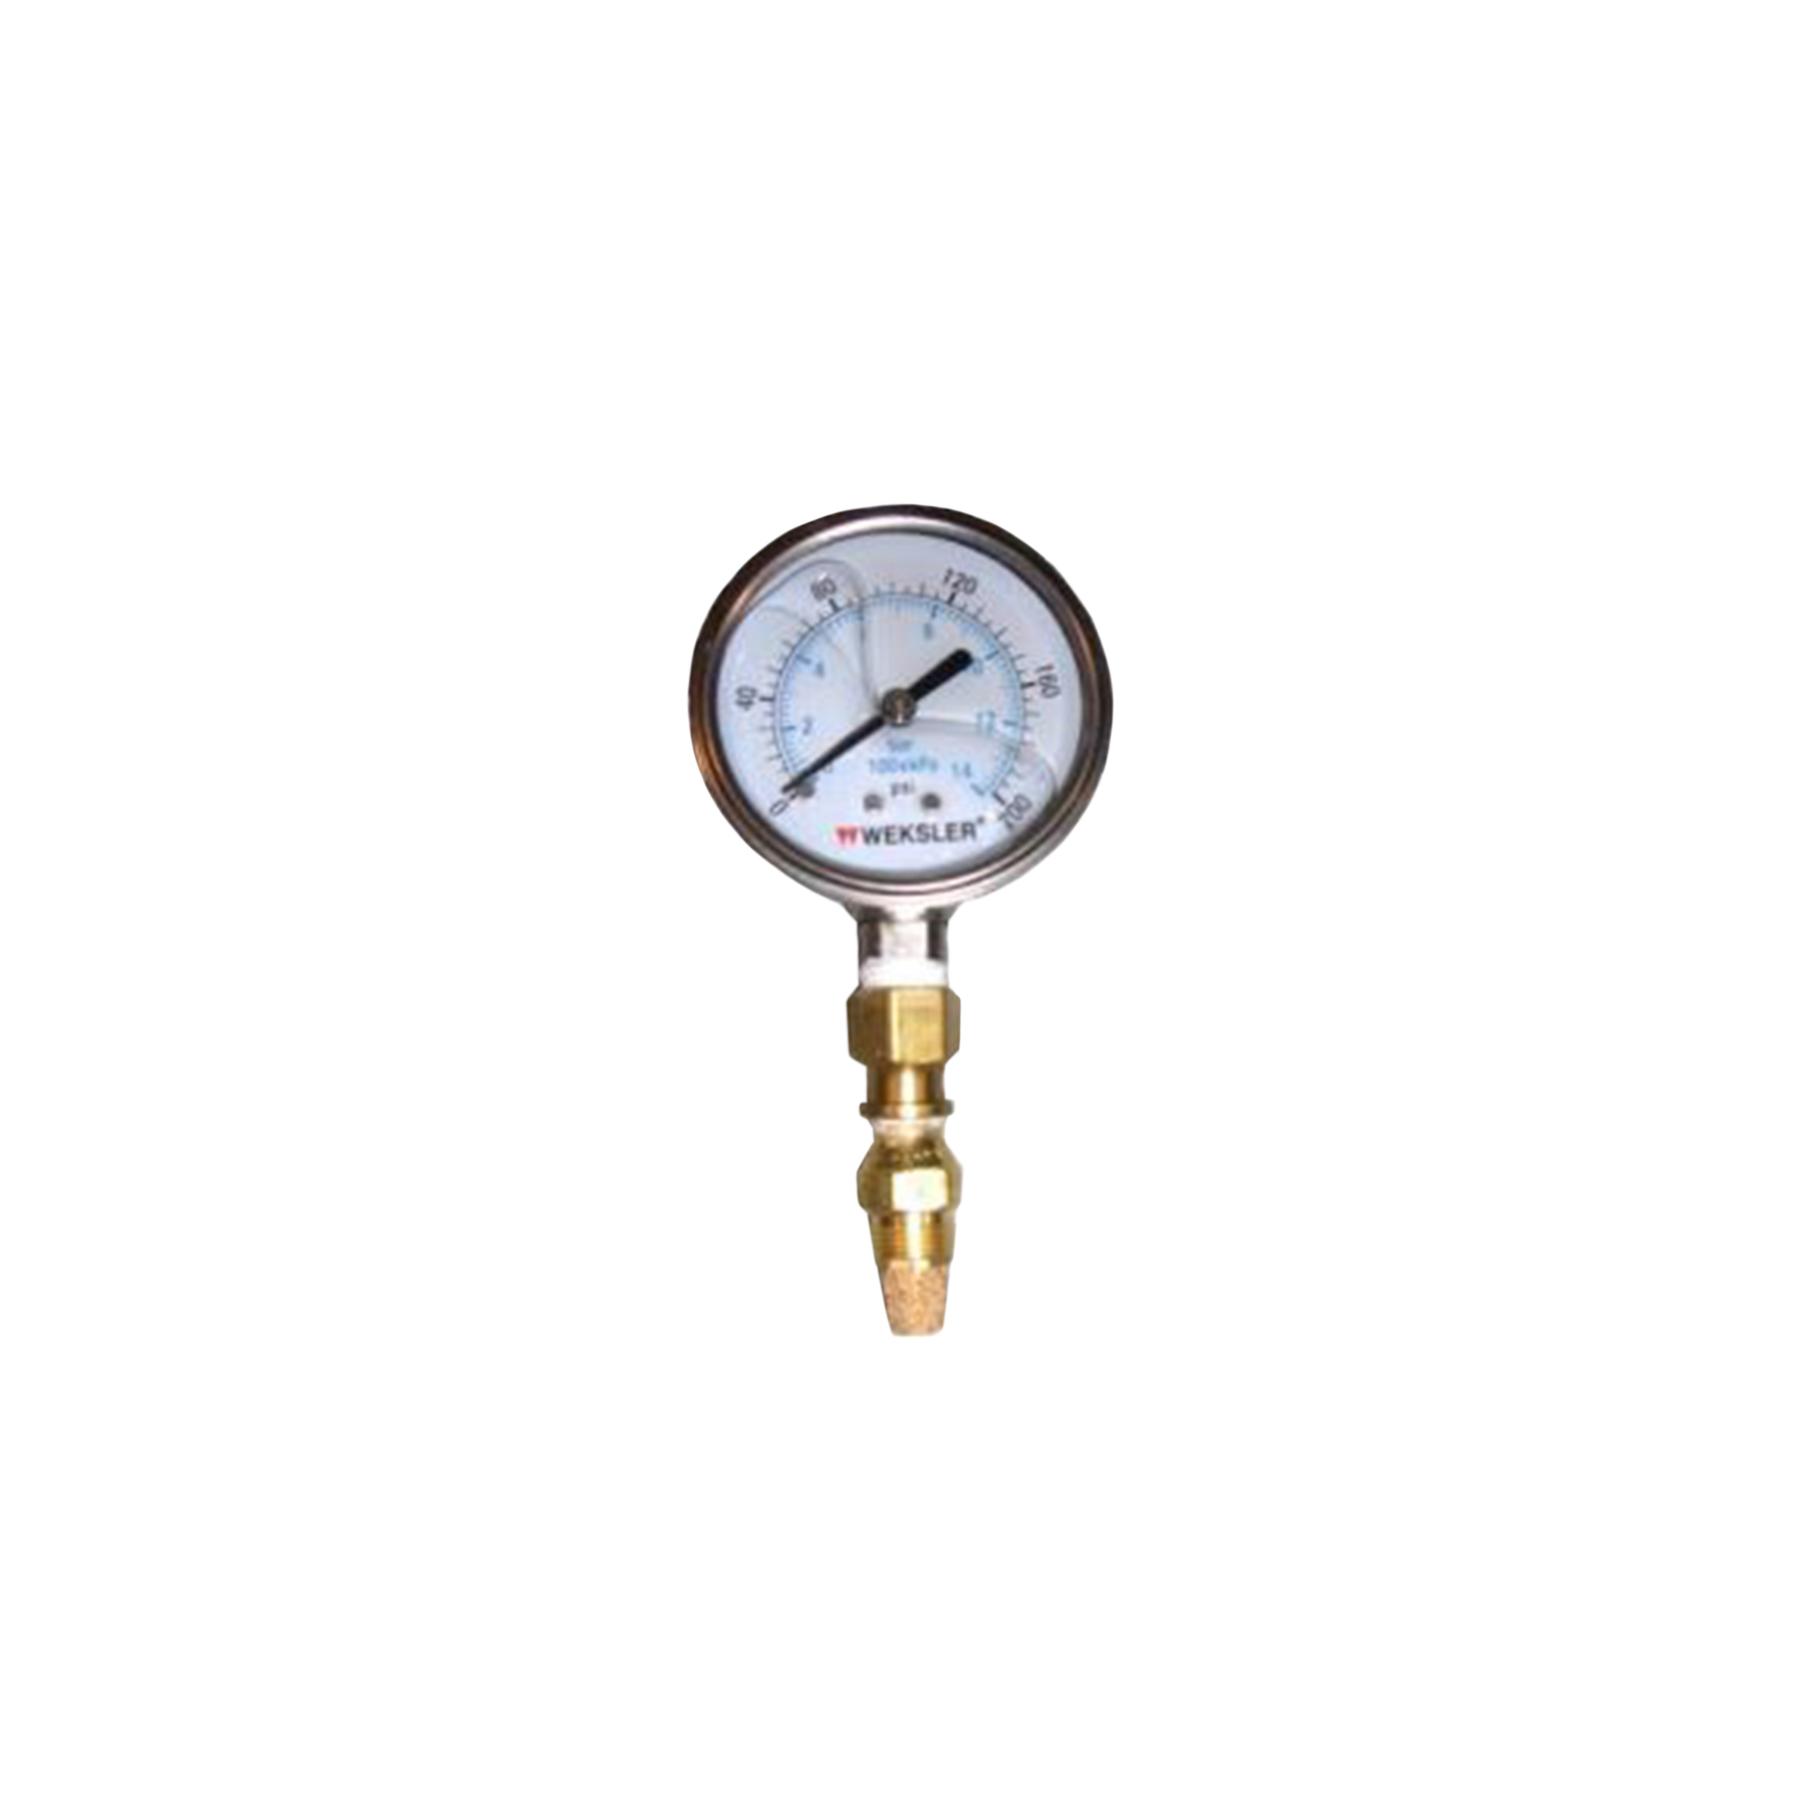 Kit, Fuel Pressure Gauge (Service Item)